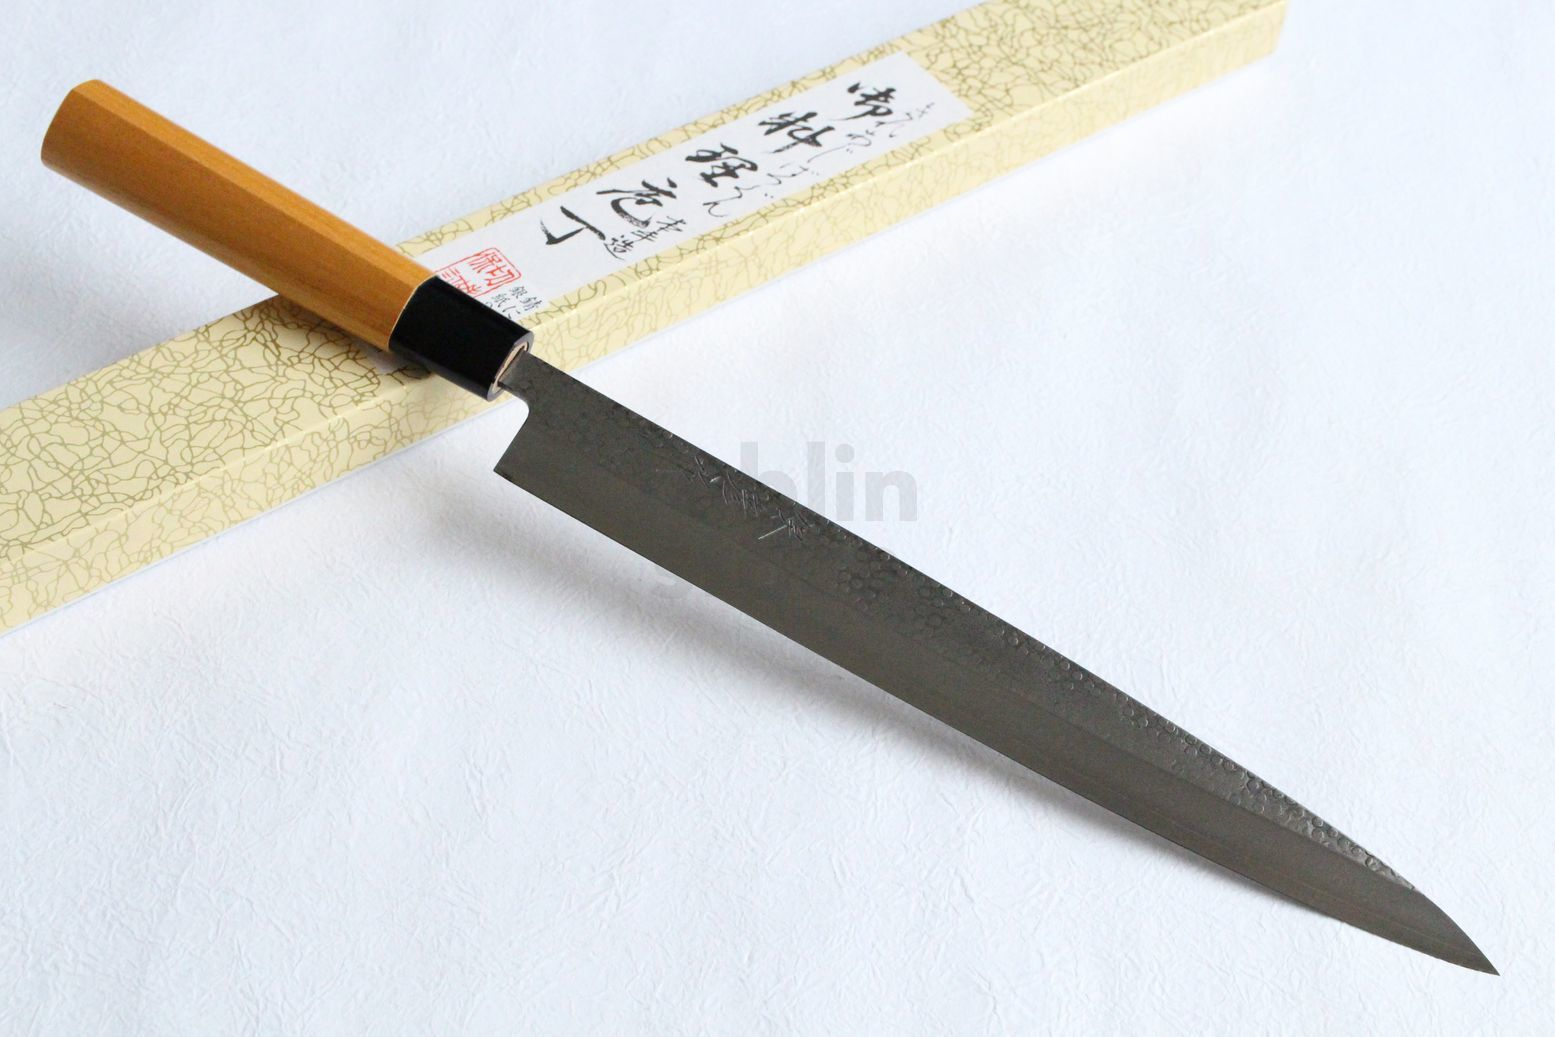 Yasuhiko Fujiwara Silver-3 steel Japanese Yanagiba Sashimi knife 270mm